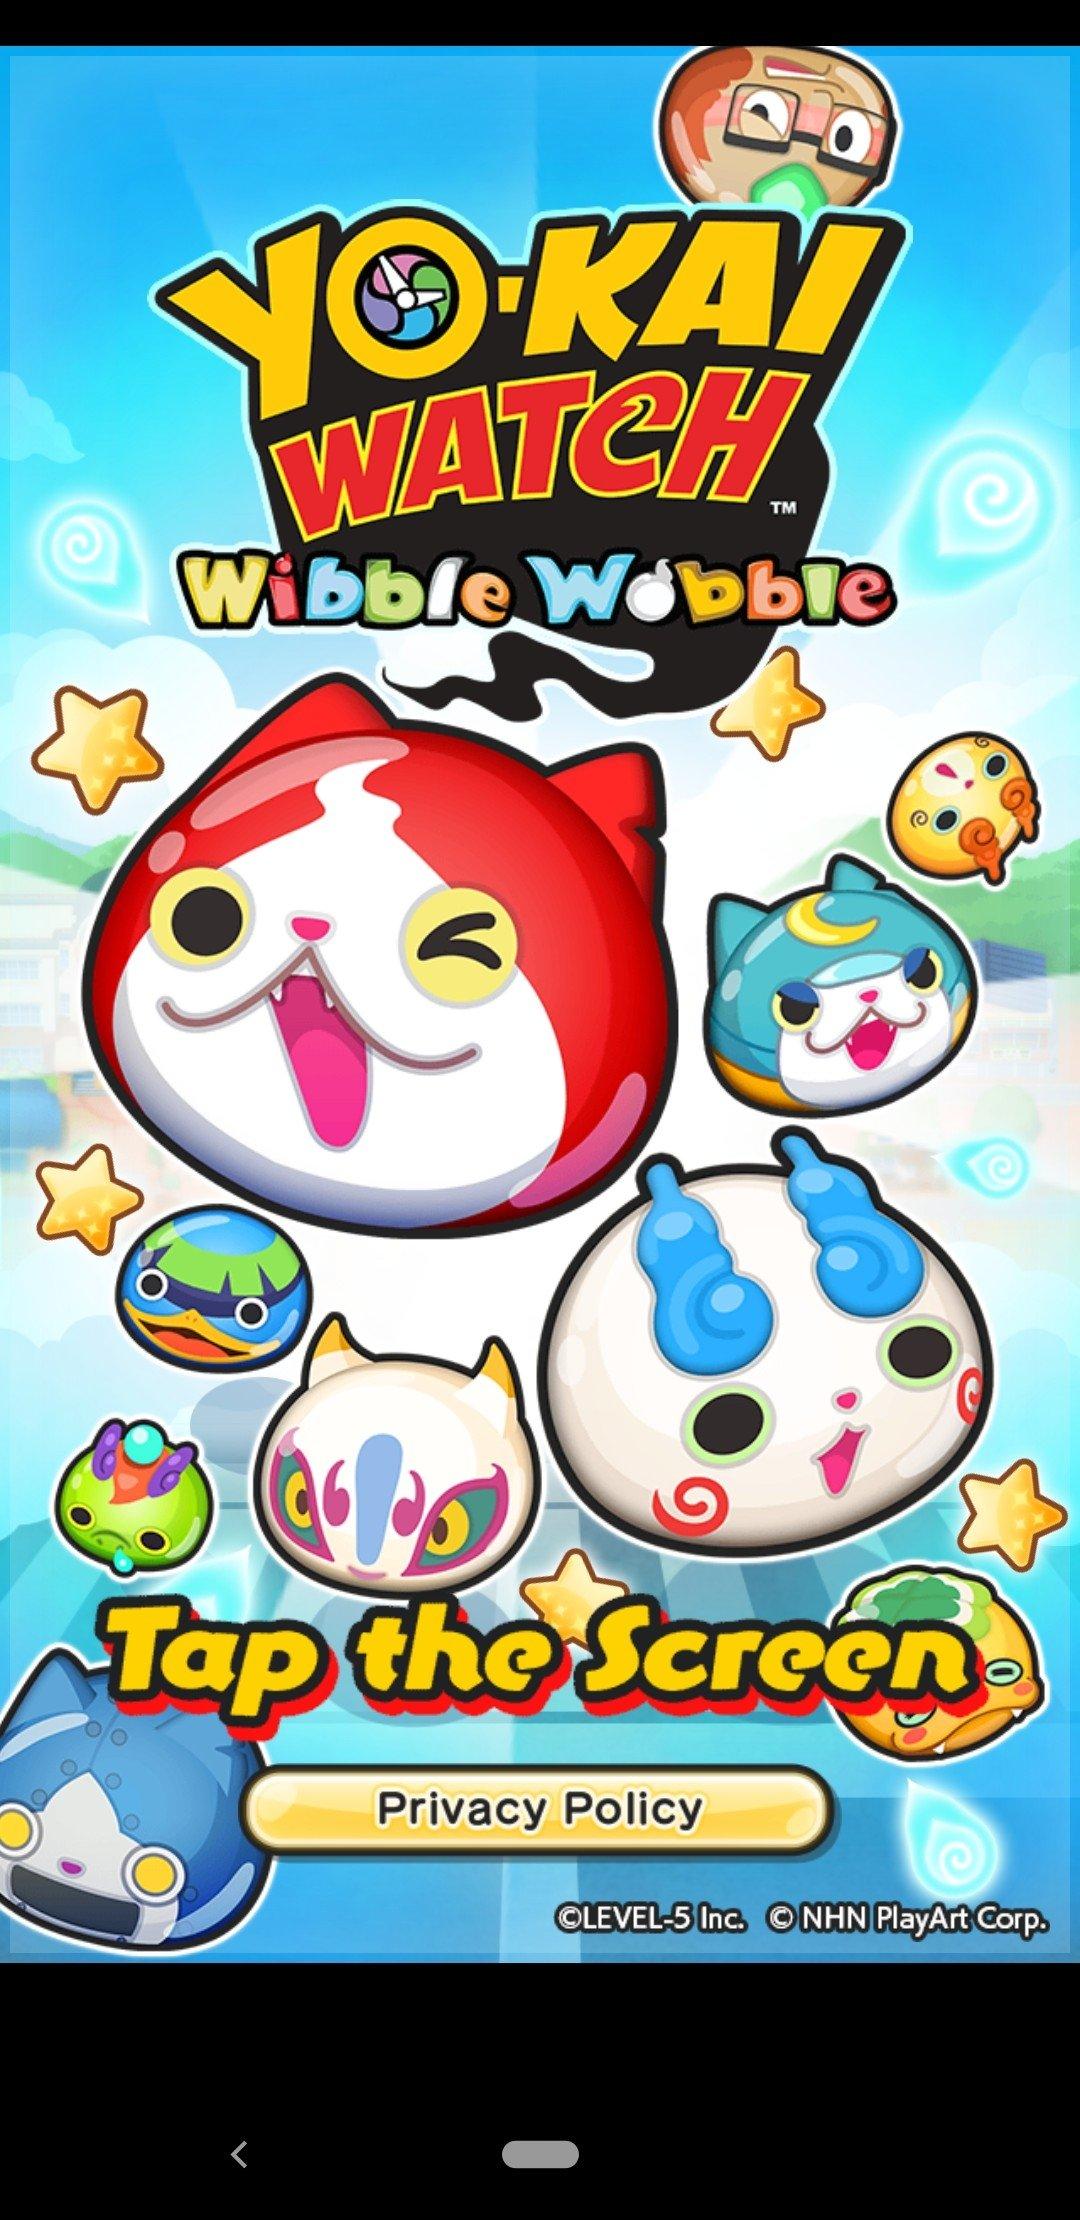 YO-KAI WATCH Wibble Wobble Android image 8